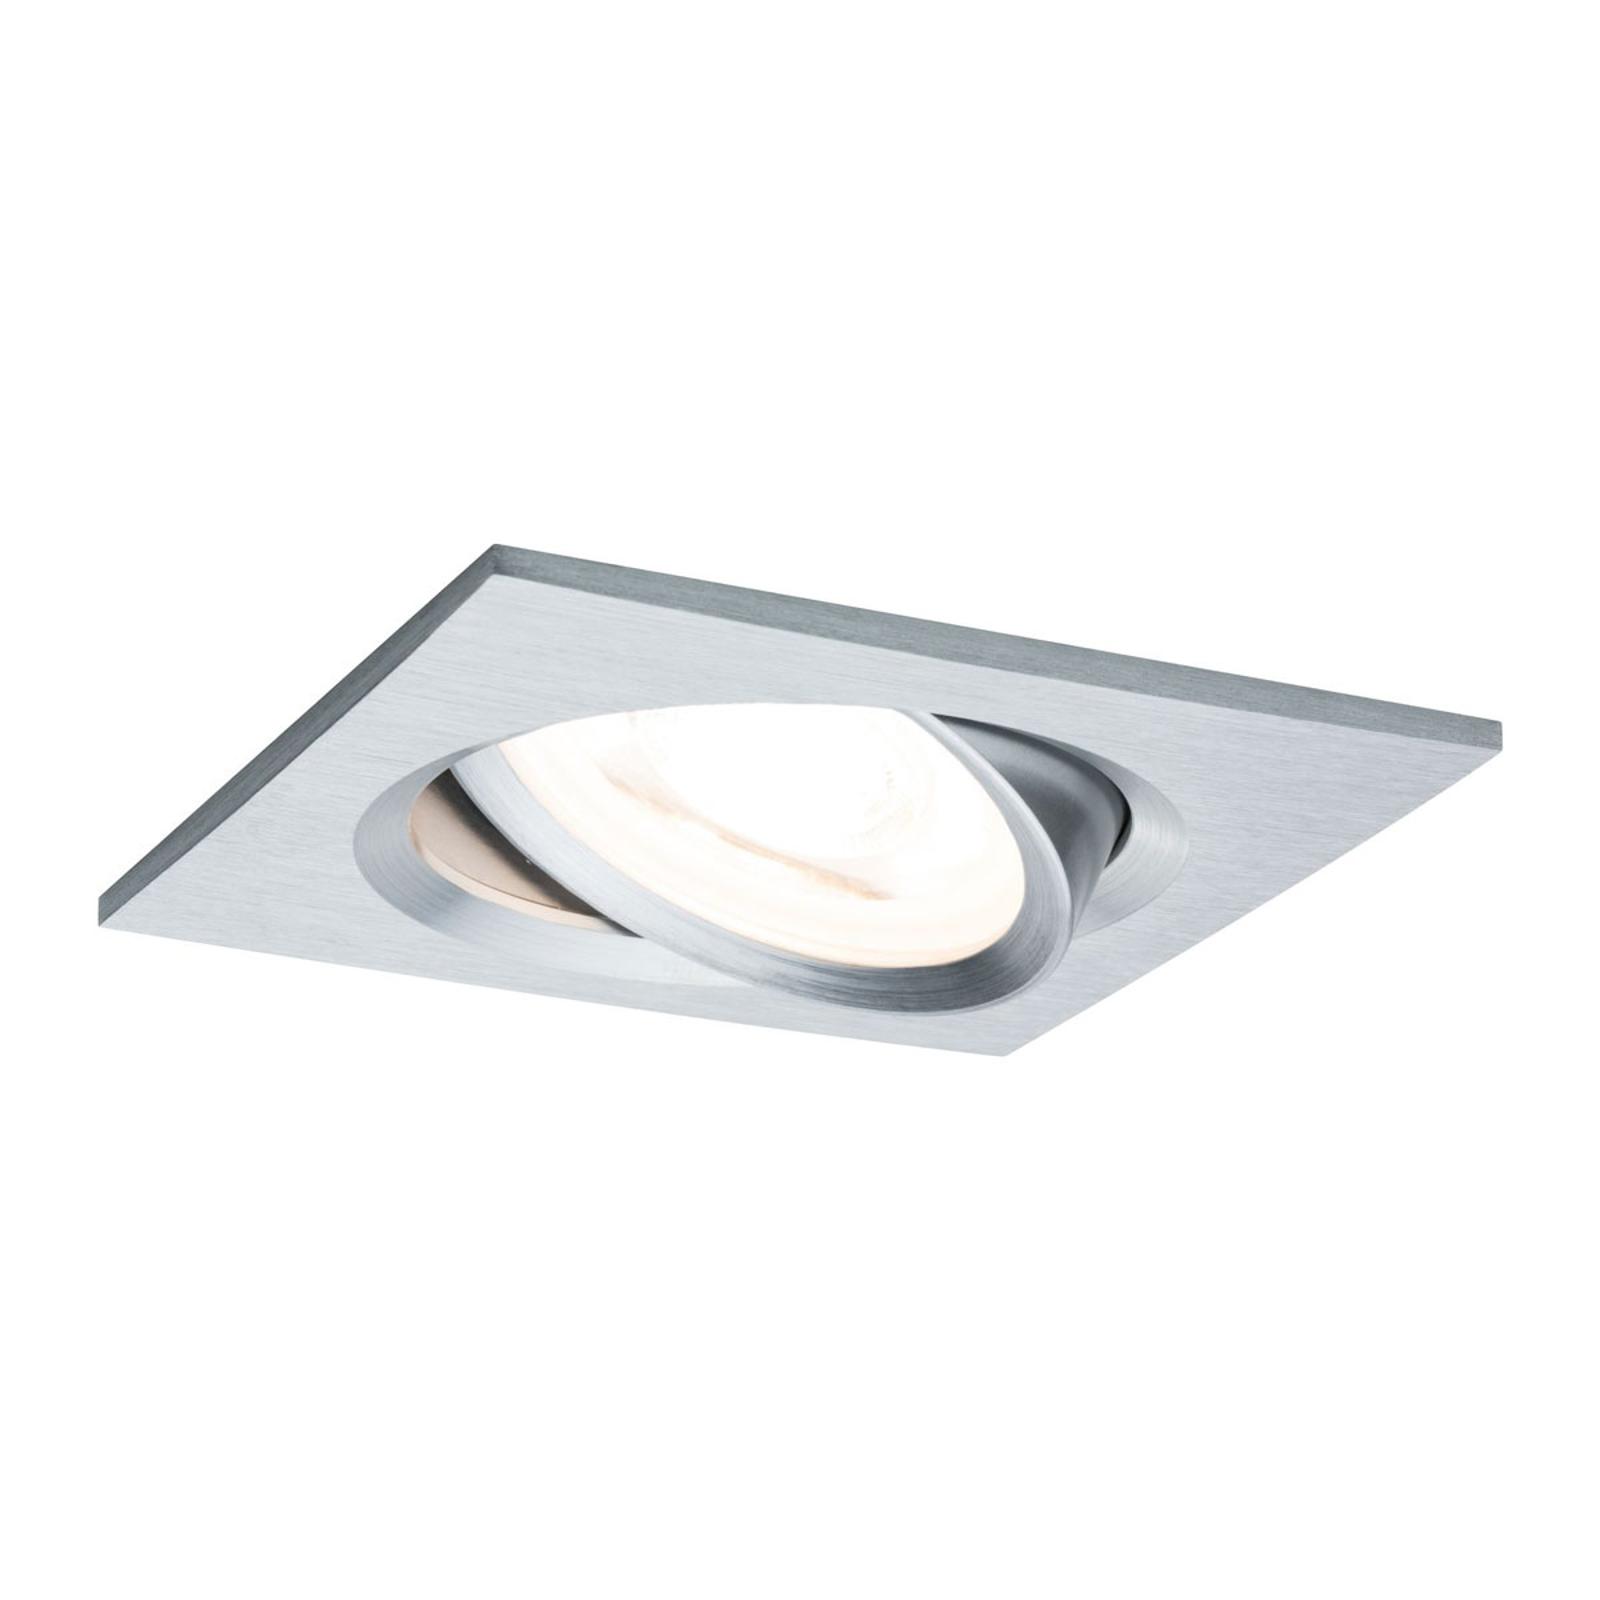 Paulmann LED-Spot Nova Coin eckig, dimmbar, Alu